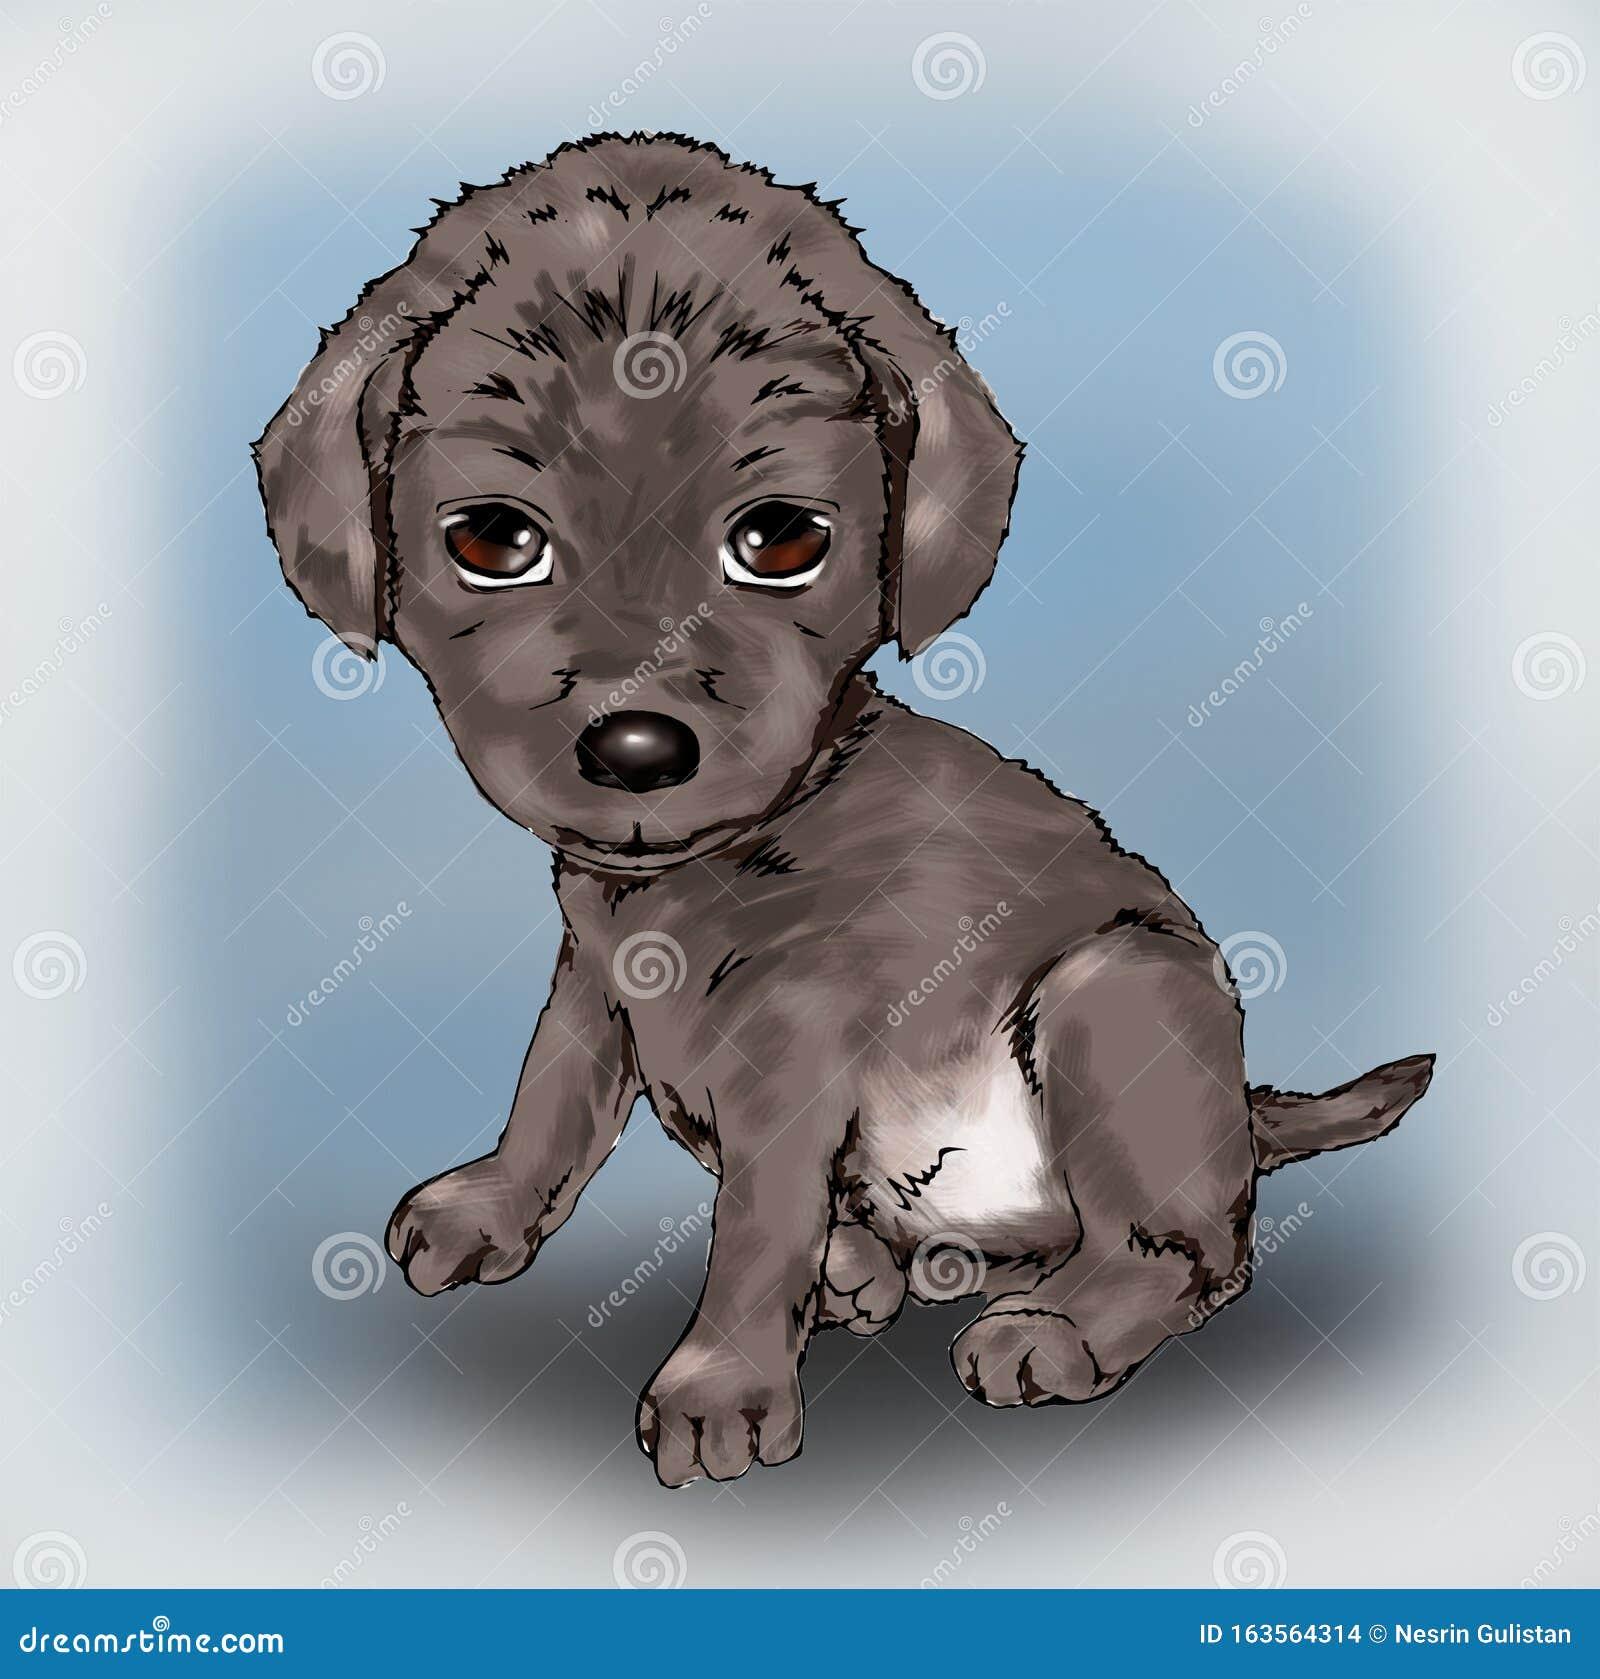 Cute Little Puppy Cute Animal Pet Animal Owner Dog Tiny Cute Animal Cute Faithful Tiny Animal Friendly Illustration Stock Illustration Illustration Of Faithful Friendly 163564314